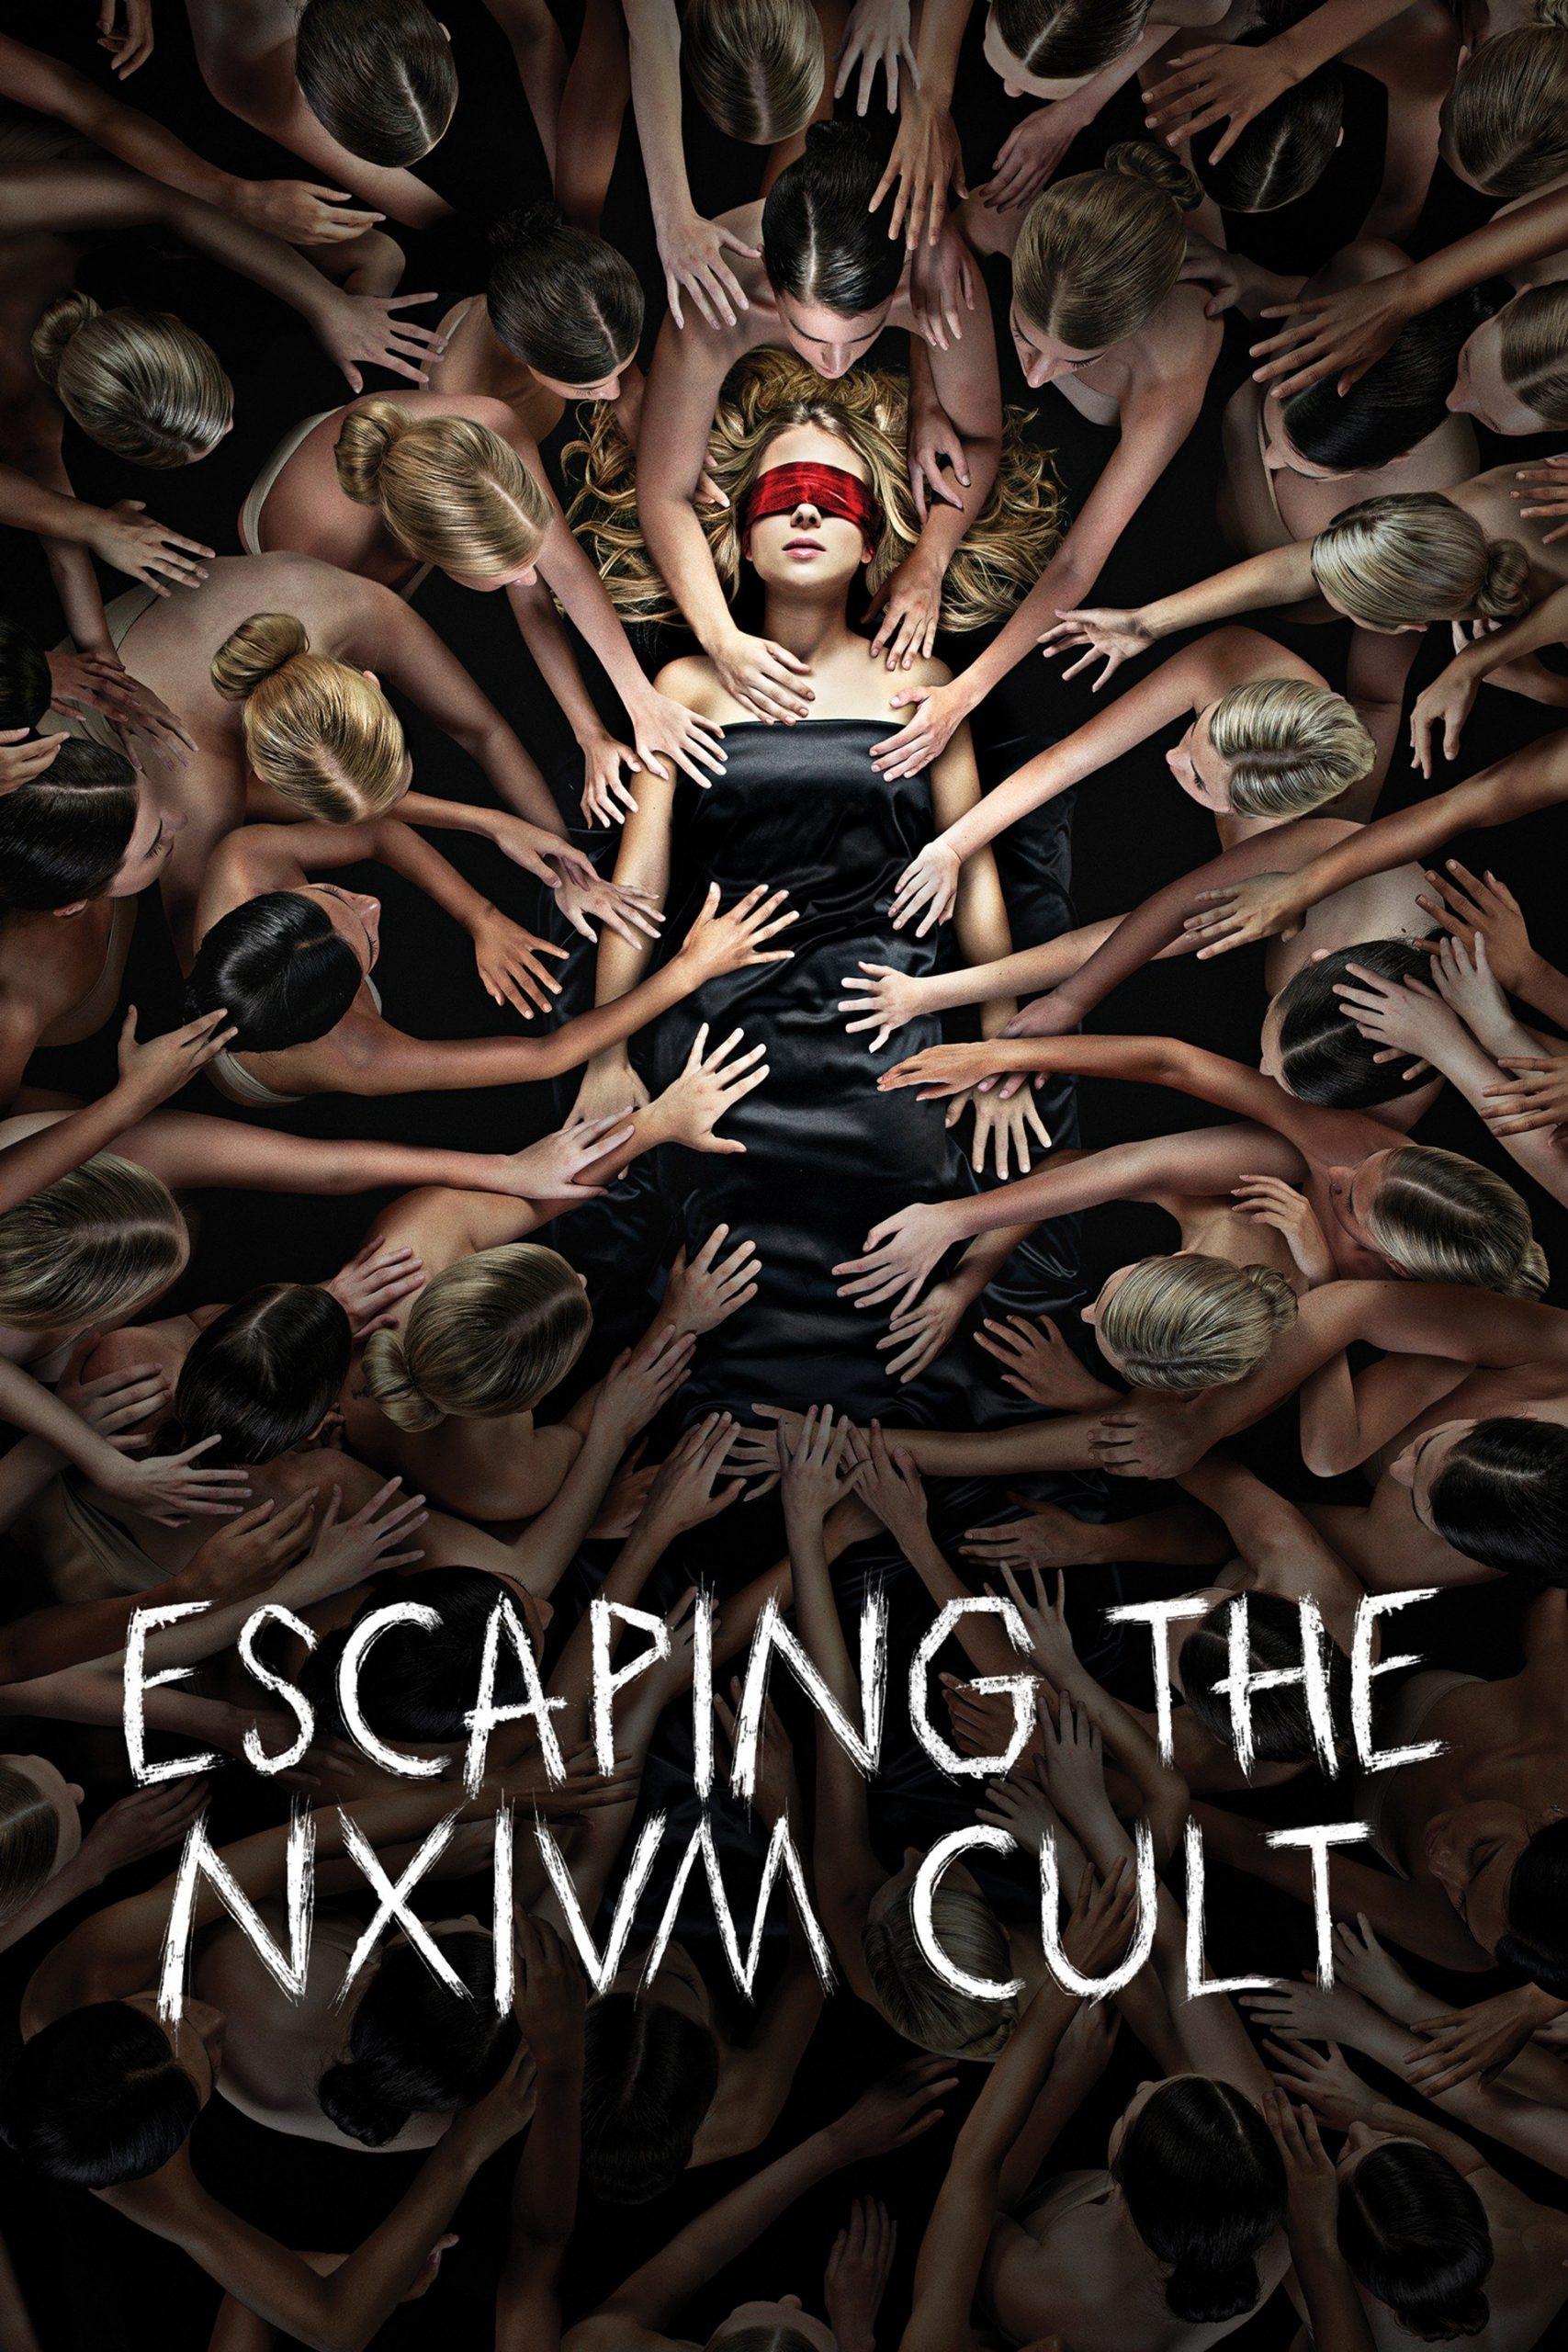 Escaping the NXIVM Cult: A Mother's Fight to Save Her Daughter (2019) ลัทธินรกเน็กเซียม การต่อสู้ของคนเป็นแม่เพื่อช่วยลูกสาว